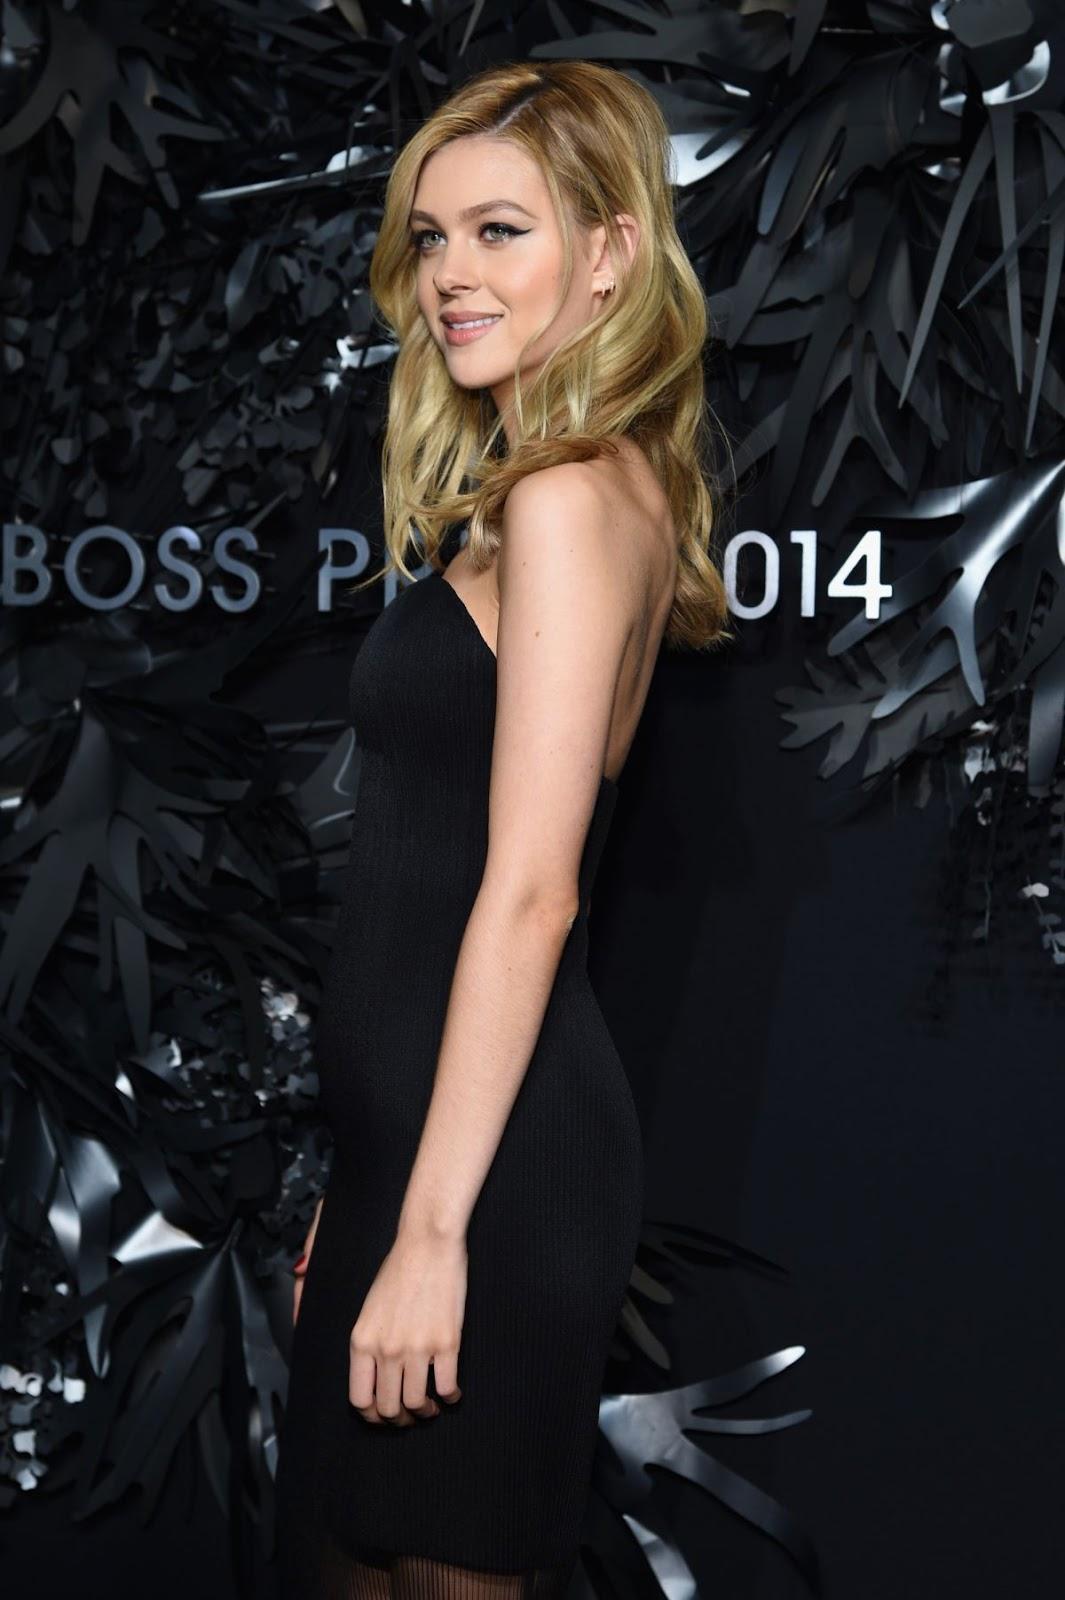 Transformers actress Nicola Peltz Full HD Photos & Wallpapers